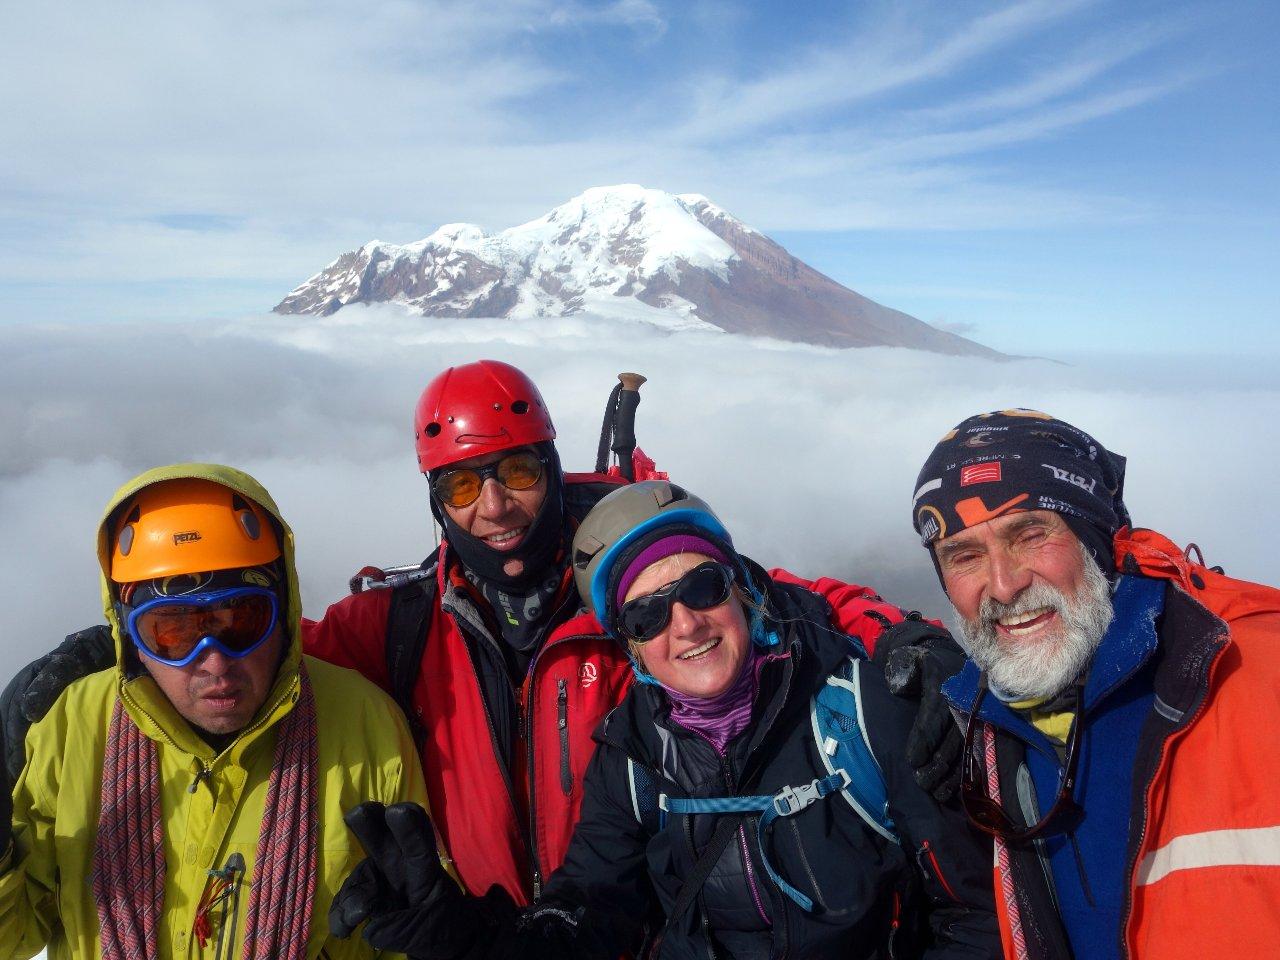 Javier, Marco, Edita and Rodrigo beneath the summit of Carihuairazo, with Chimborazo floating above the clouds